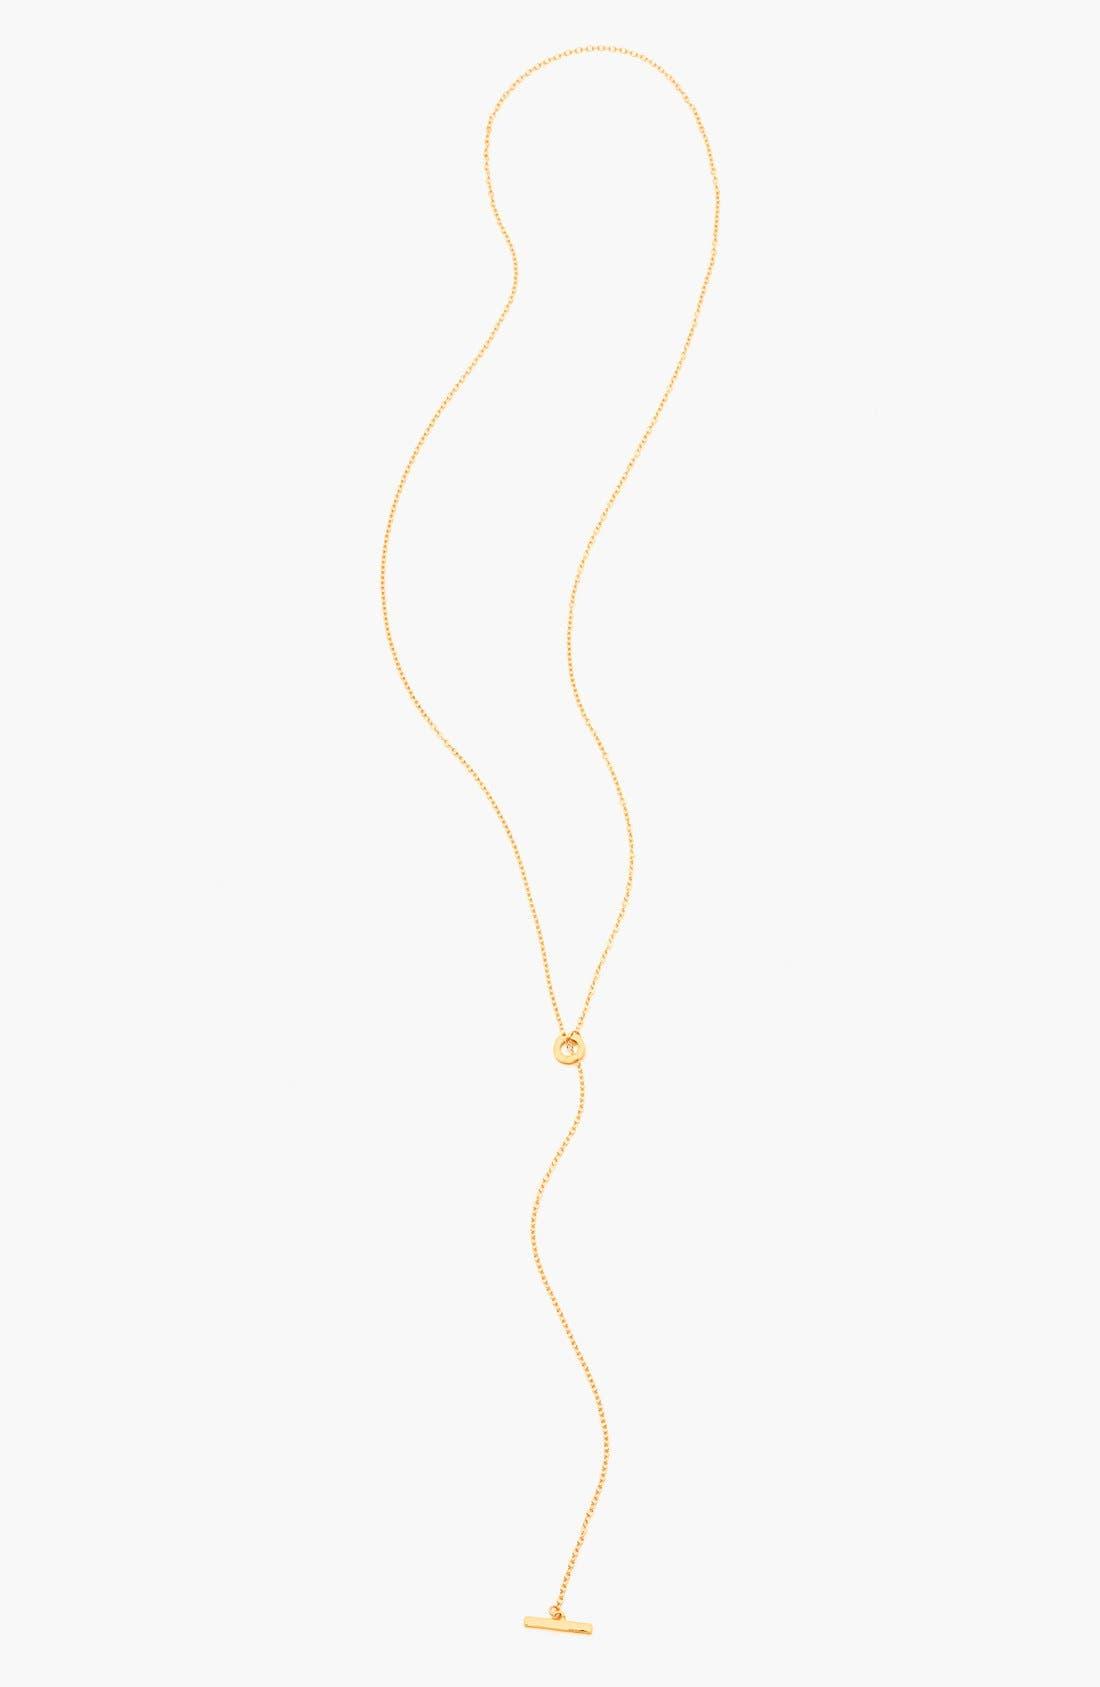 Alternate Image 1 Selected - gorjana 'Taner' Toggle Lariat Necklace